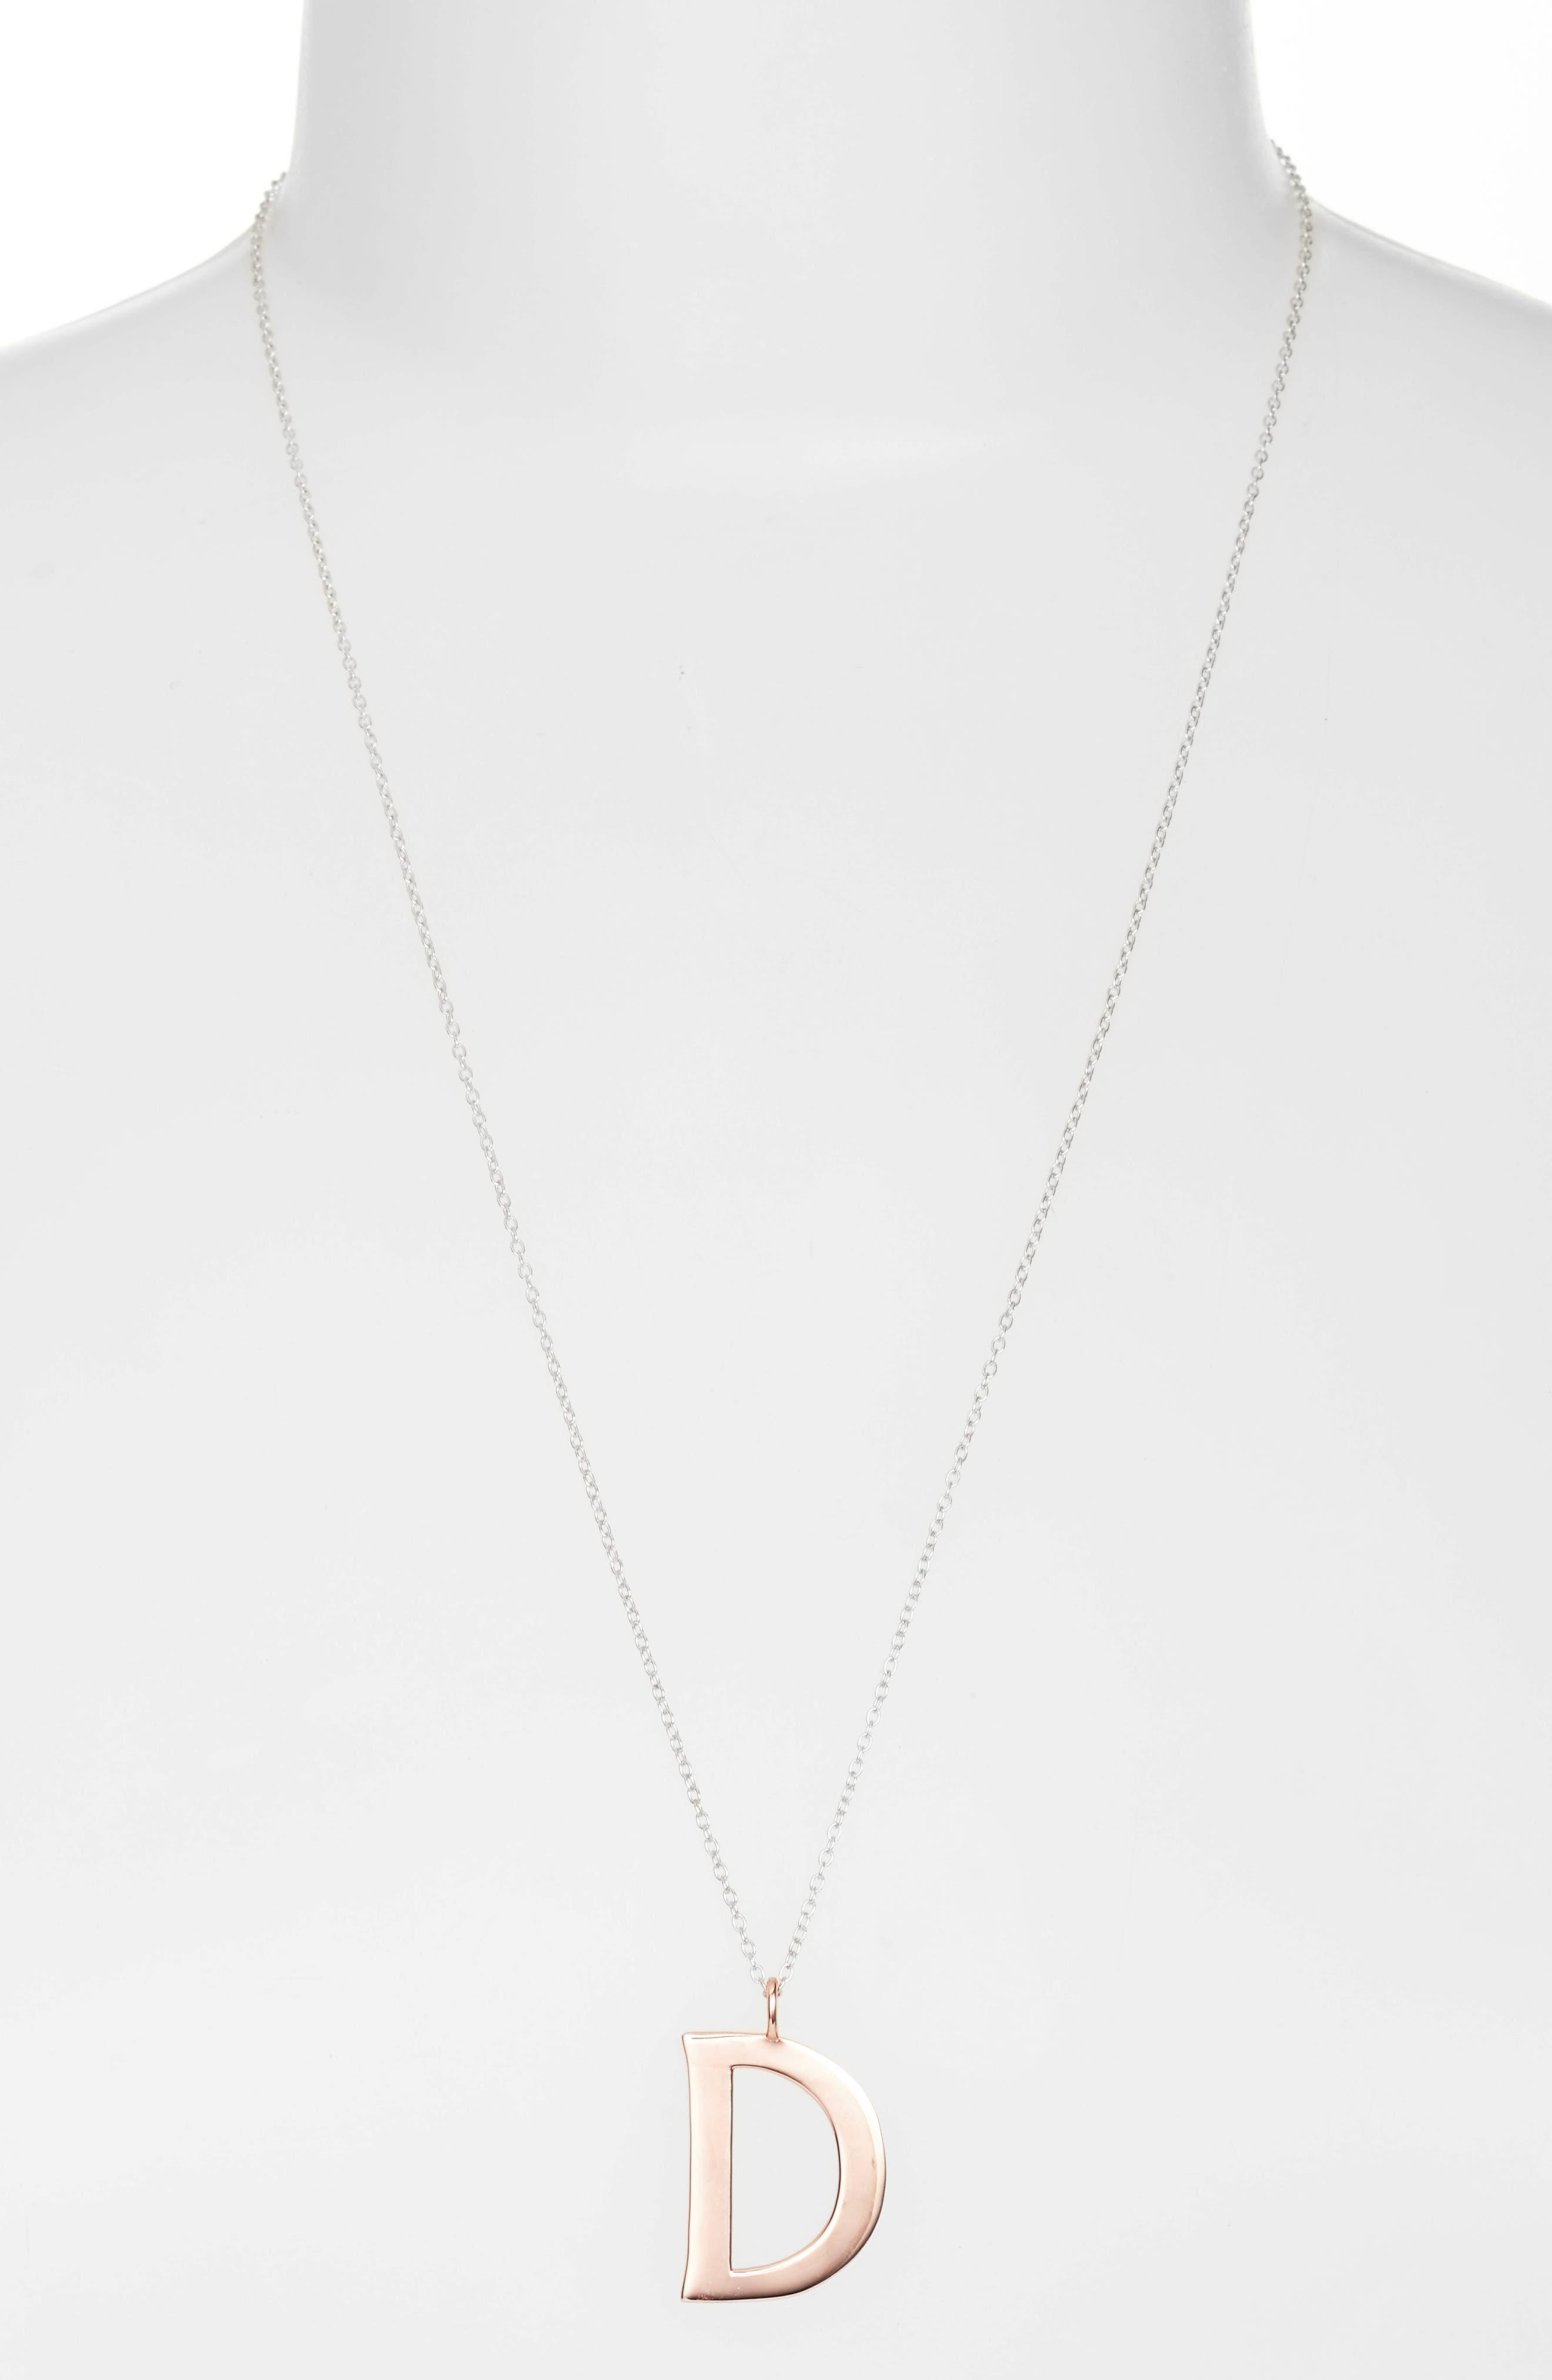 Initial Pendant Necklace,                             Main thumbnail 1, color,                             ROSE GOLD / SILVER - D